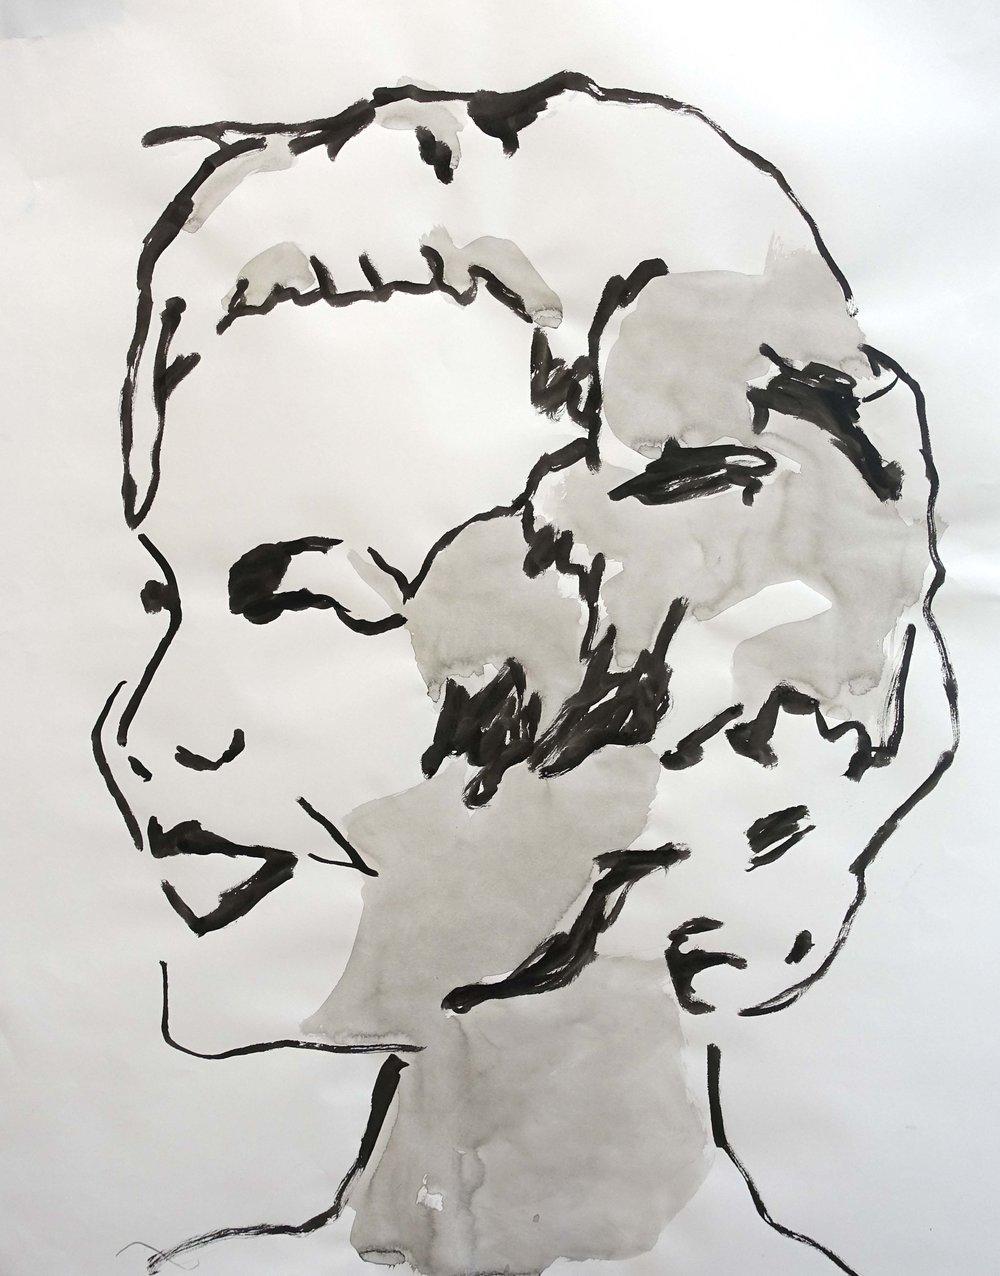 Charlotte mahdavy_dessin LILI 2.jpg